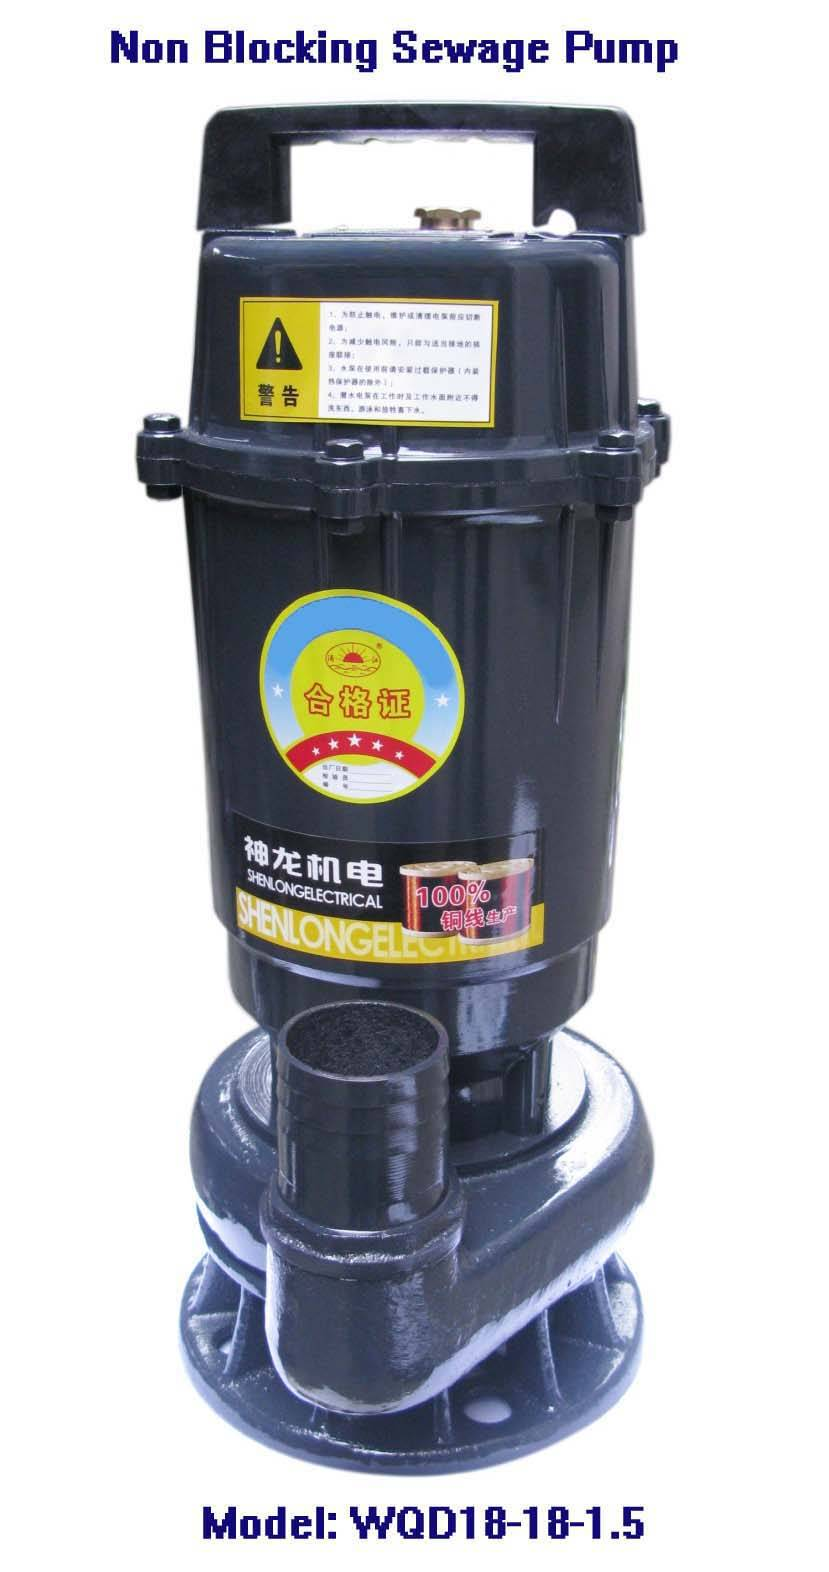 Electric Non-blocking Sewage Pump-WQD18-18-1.5